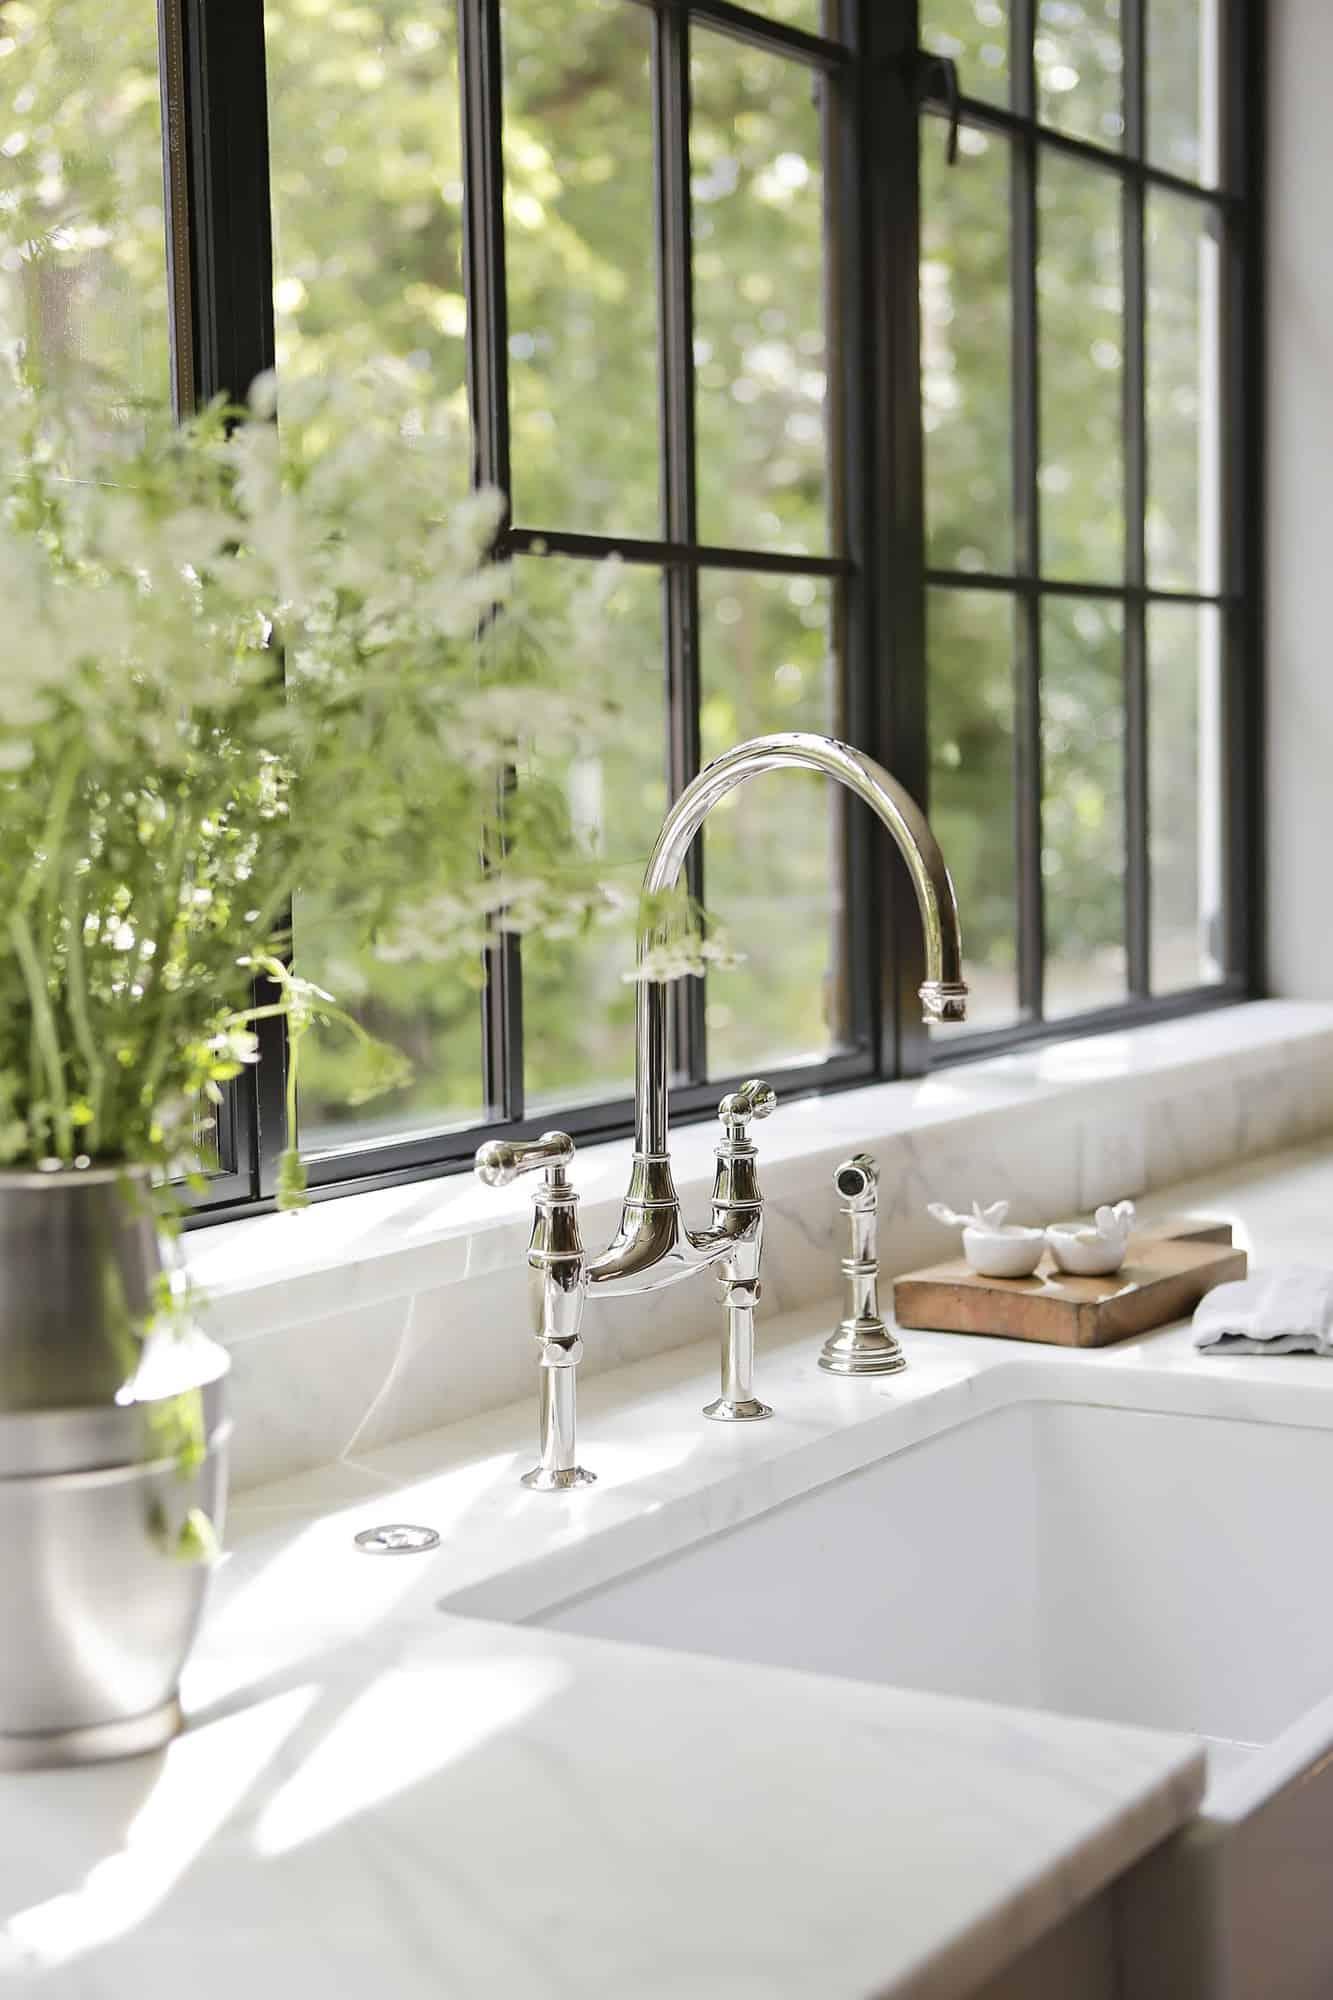 transitional-style-white-kitchen-sink-detail